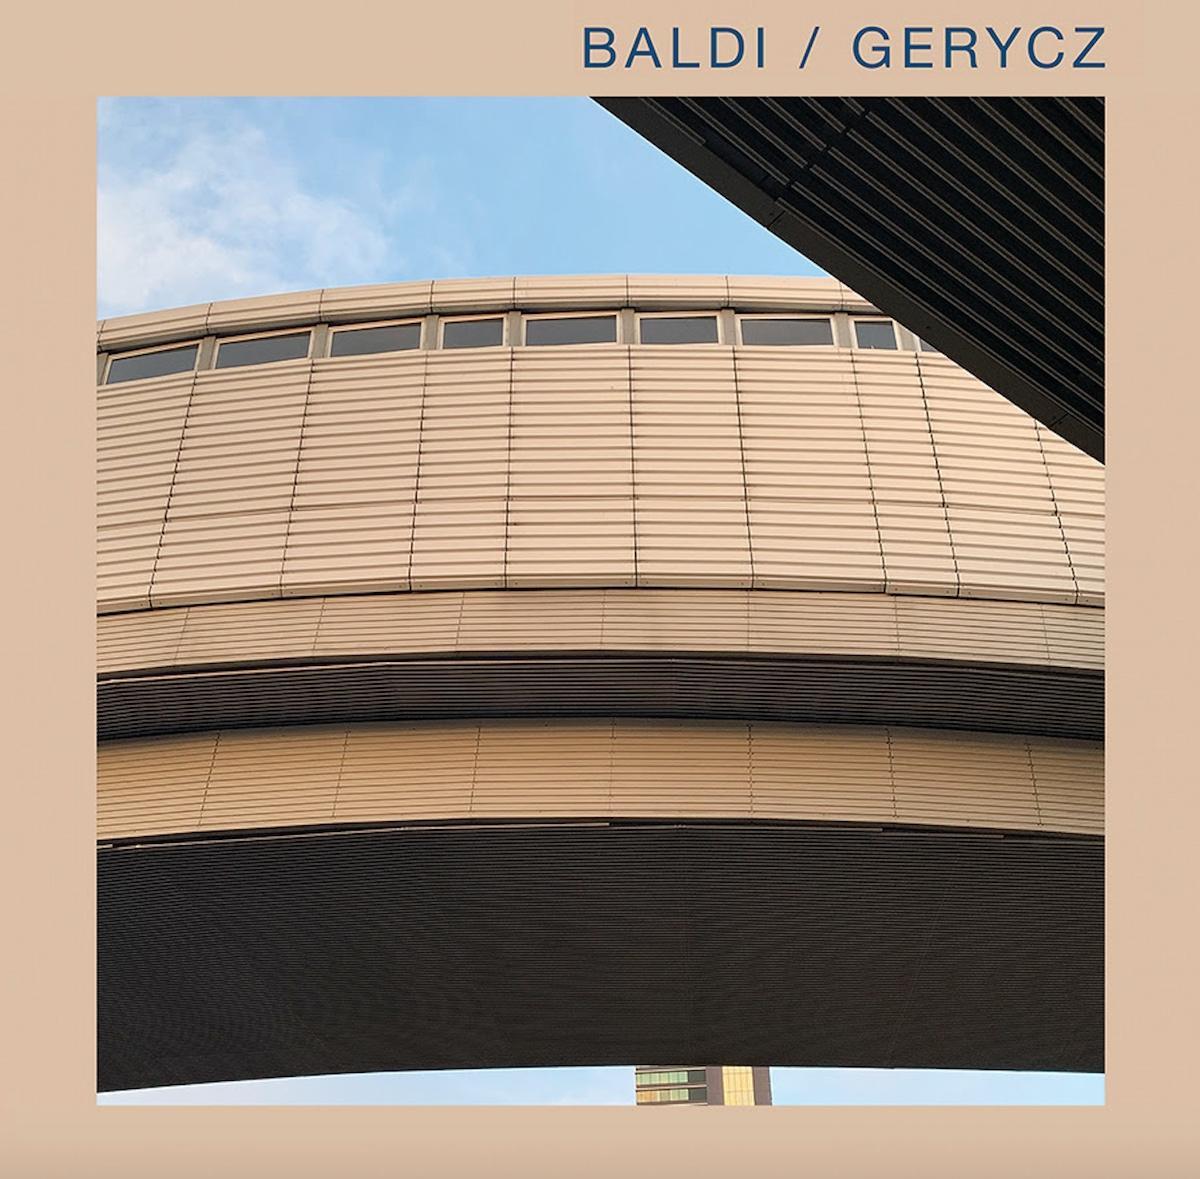 Cloud Nothings Dylan Baldi and Jayson Gerycz Baldi Gerycz Duo Blessed Repair album cover artwork jazz